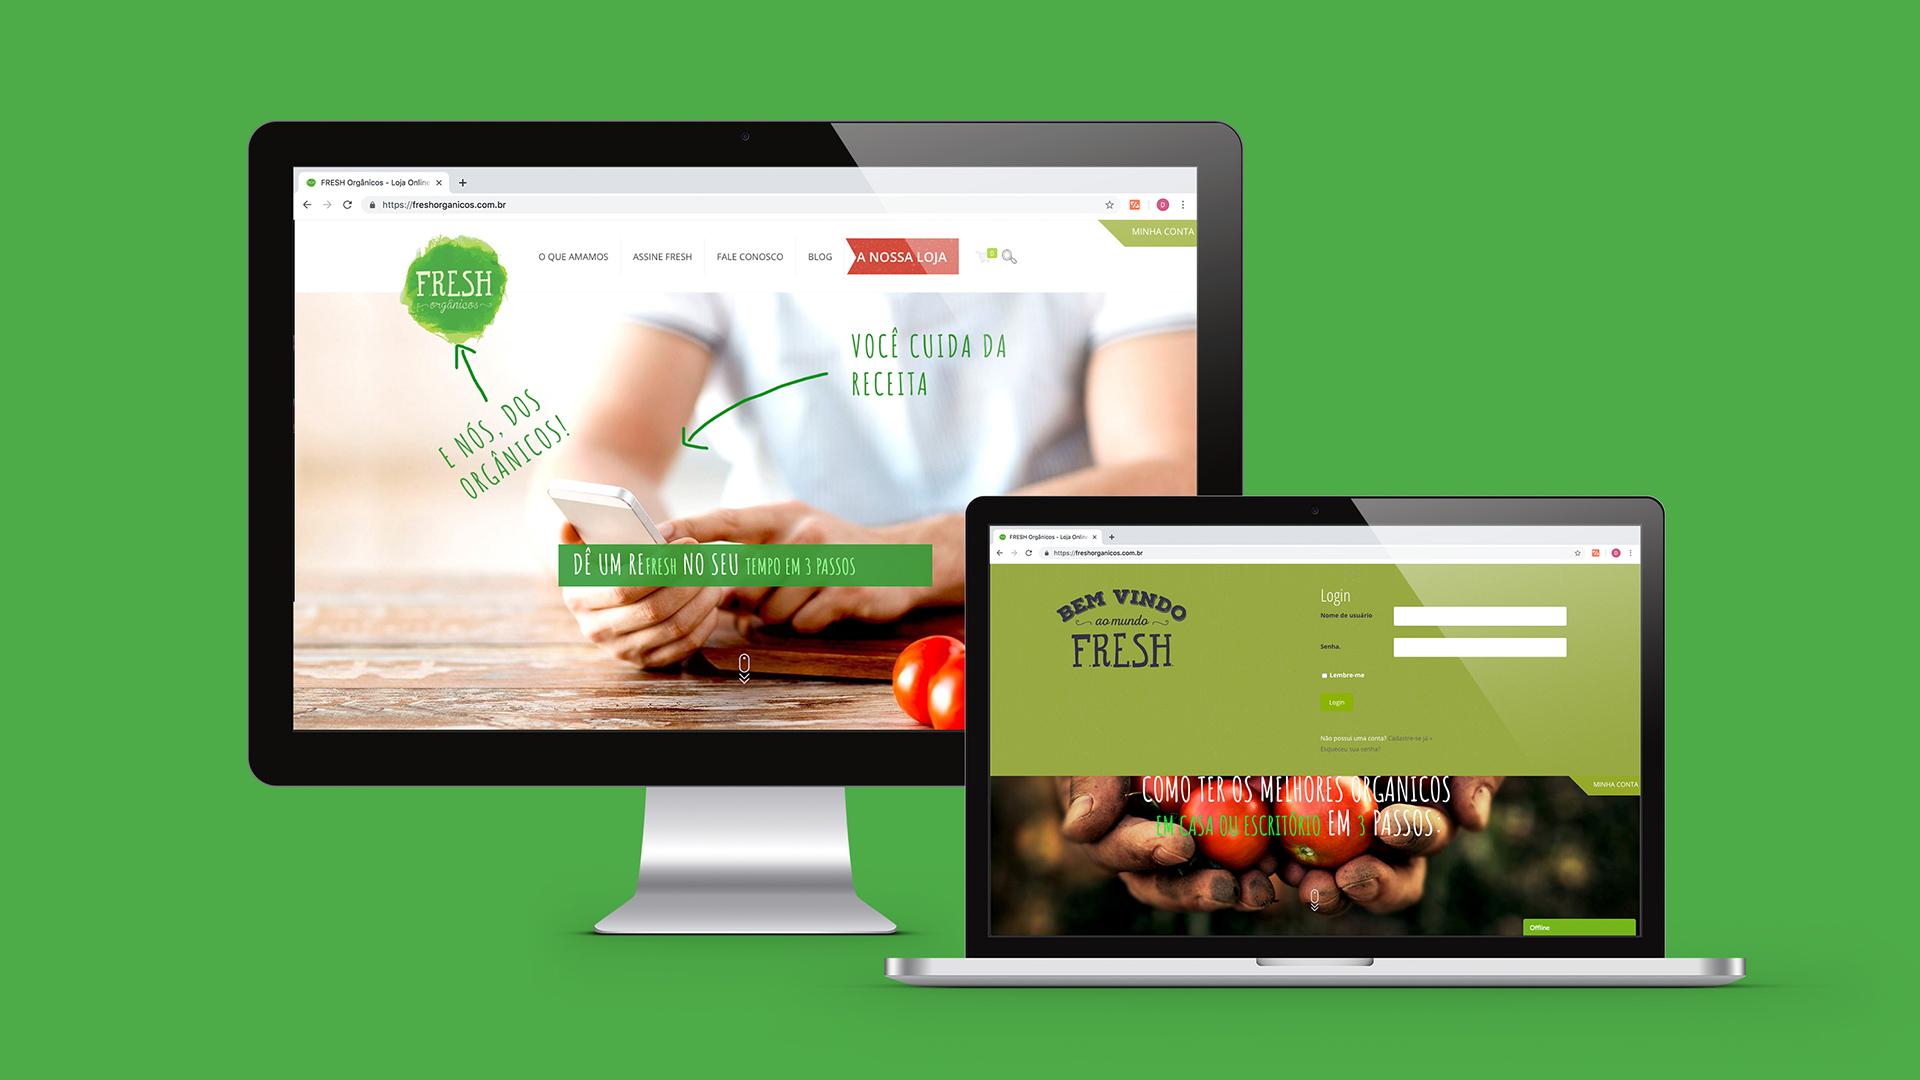 Freshorganicos mockup web Design